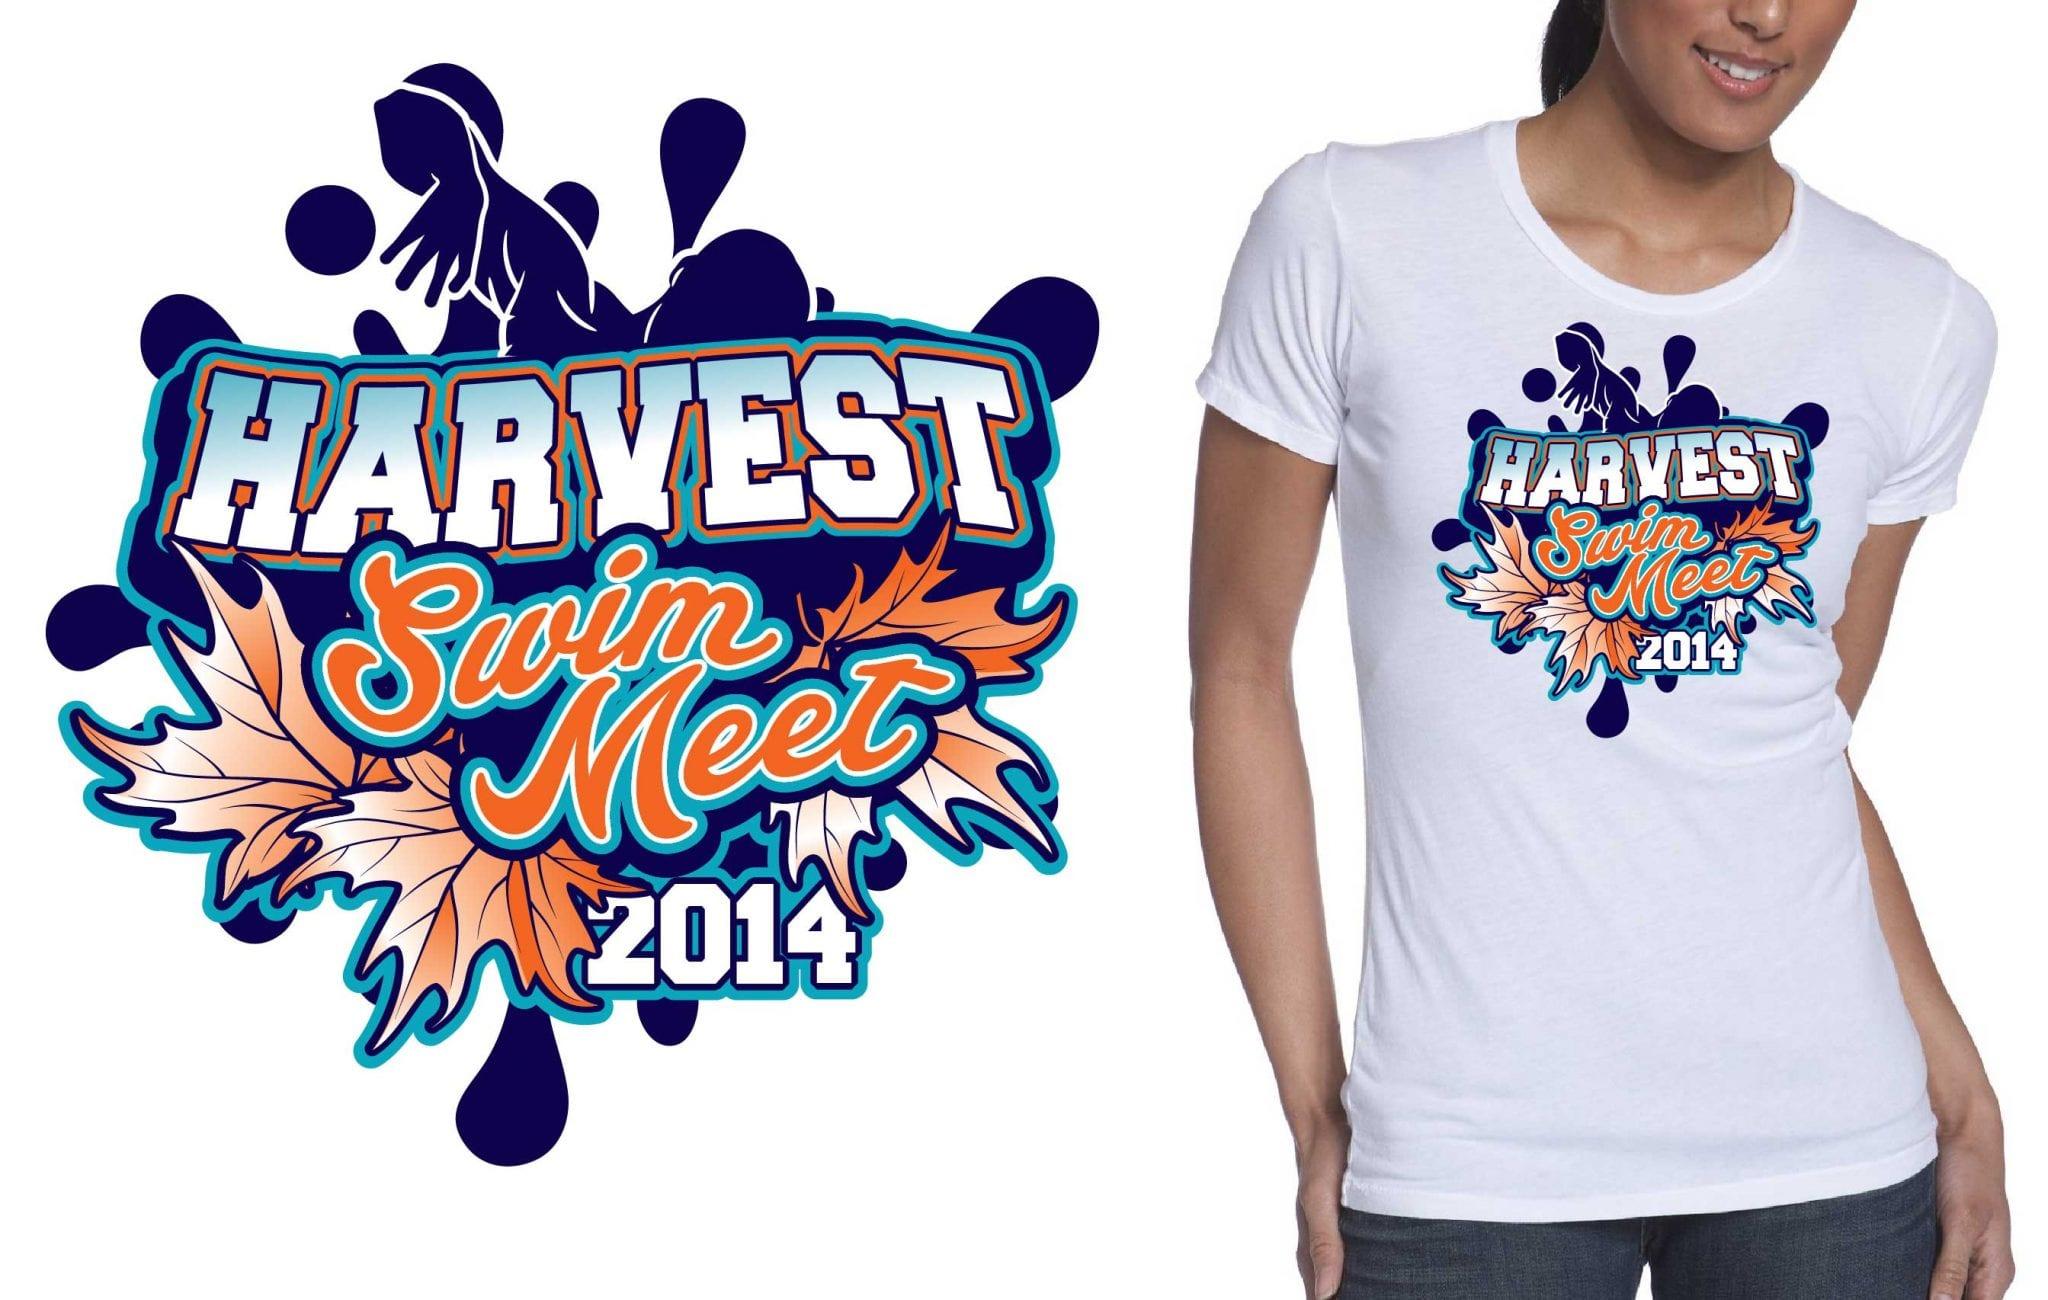 Shirt design of 2014 - Shirt Design Of 2014 60